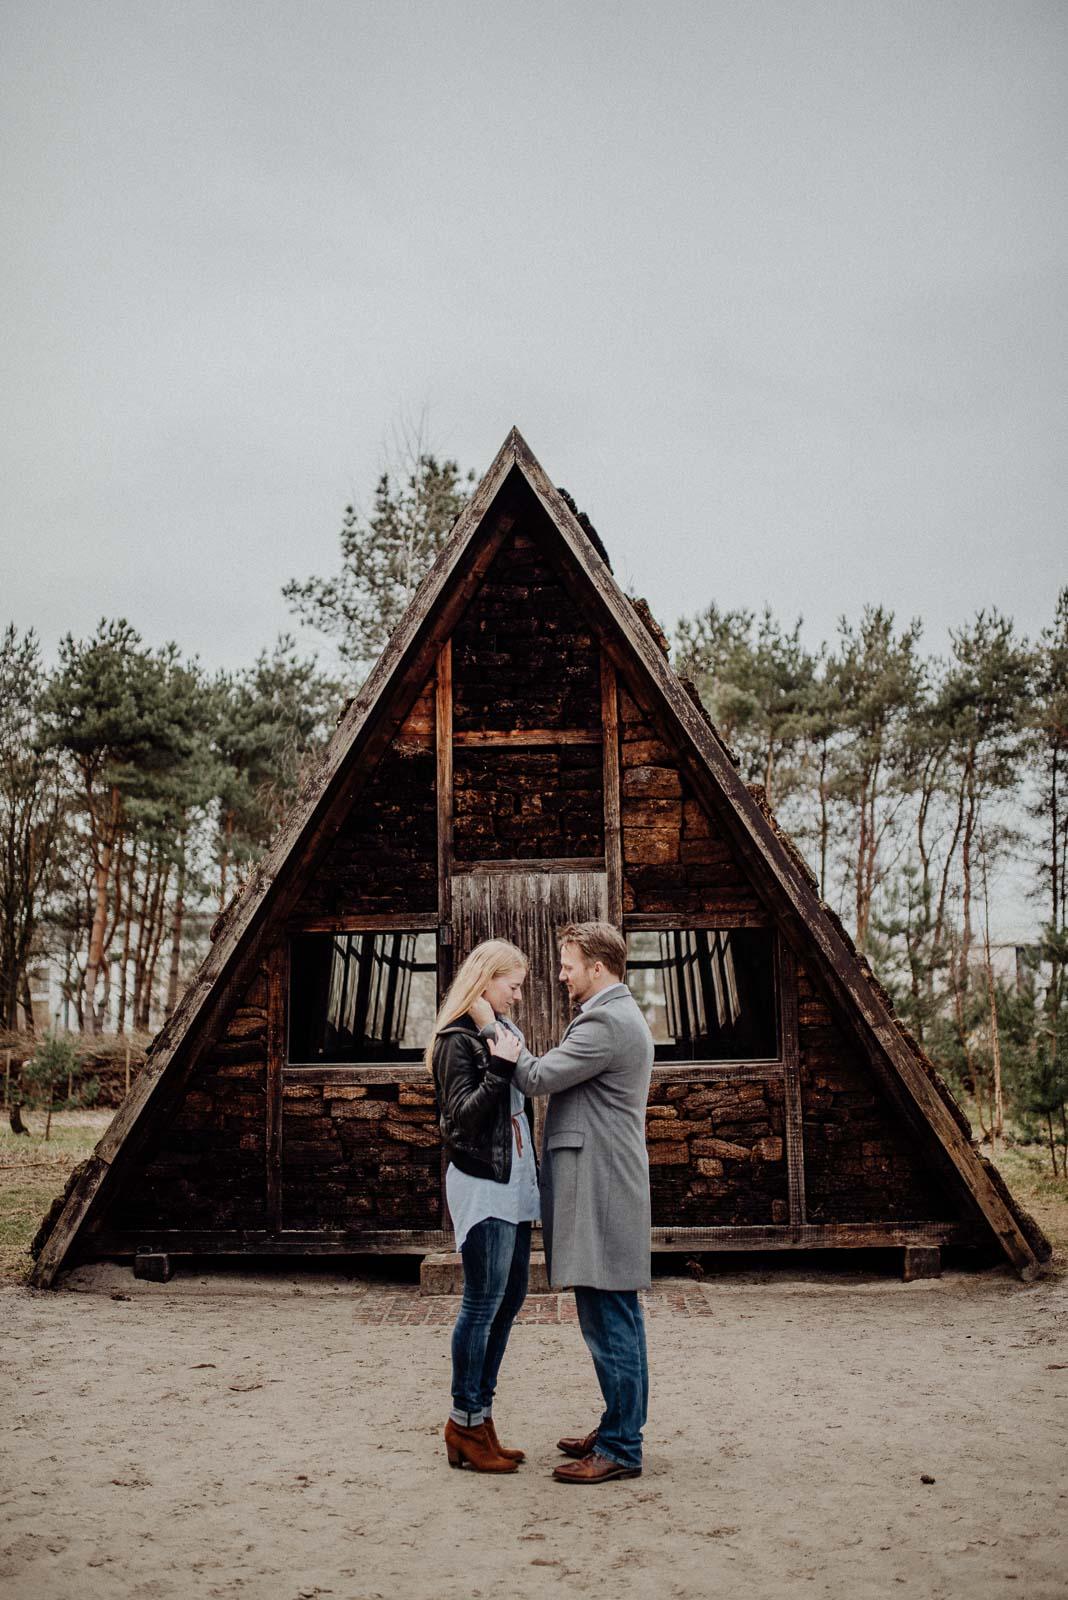 043-verlobungsshooting-engagement-fotograf-witten-rombergpark-dortmund